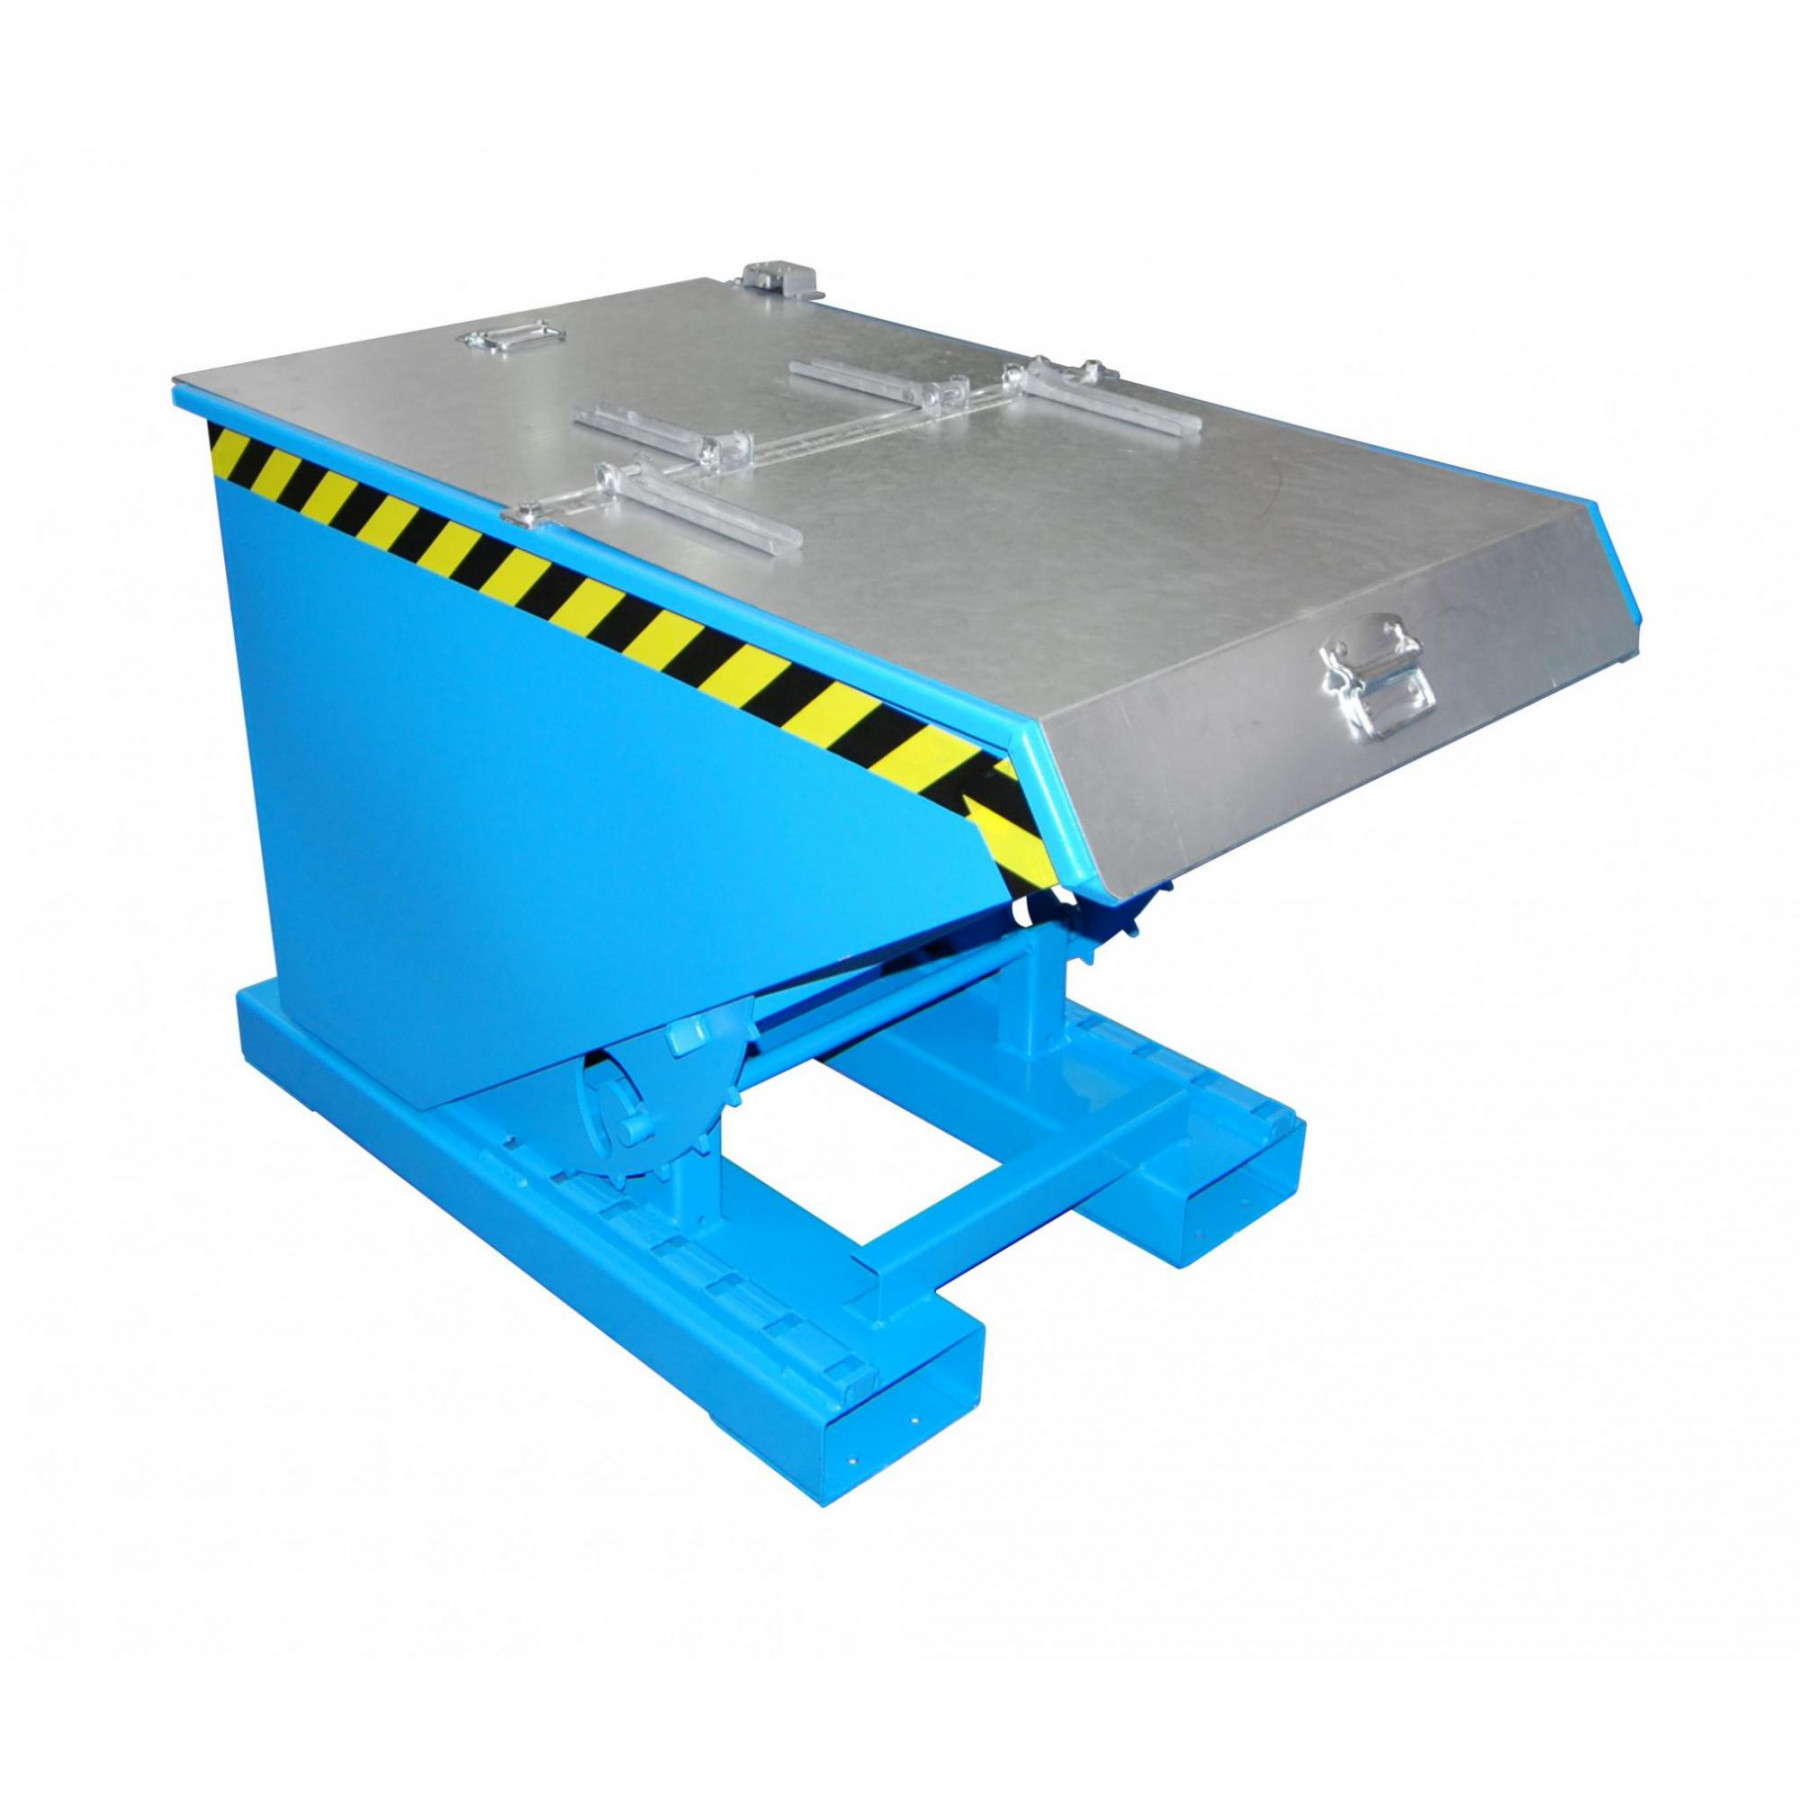 Verzinkt deksel t.b.v. kiepcontainer 300 liter, MTF-300-DEKSEL